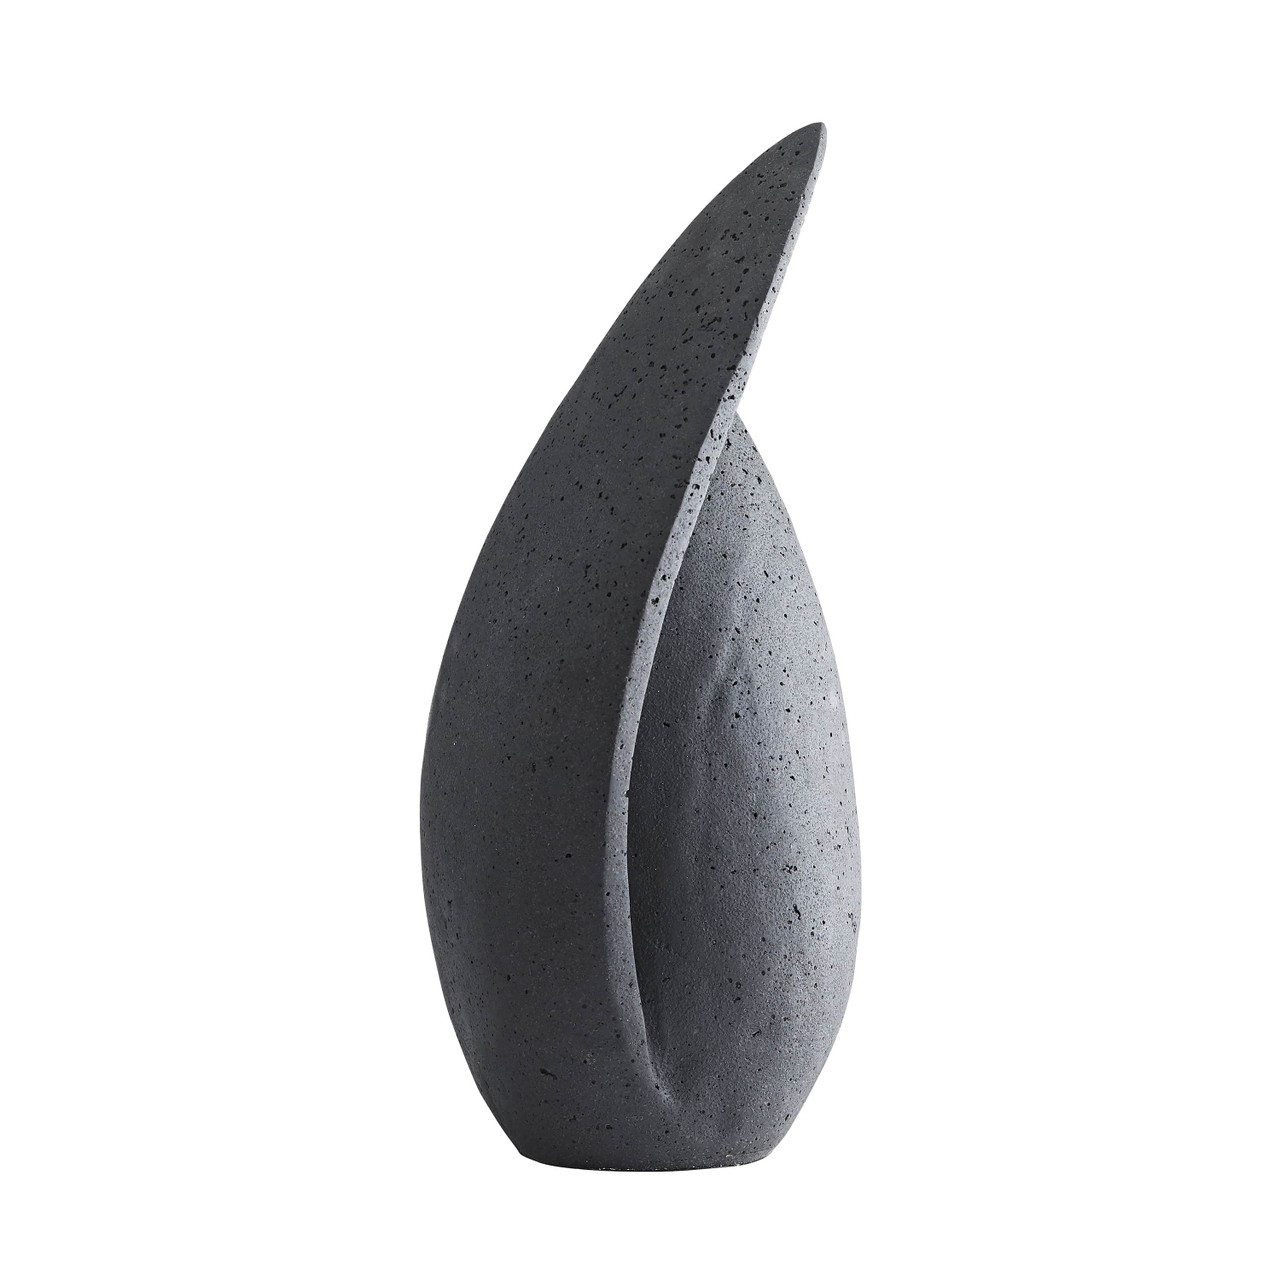 Milano Teardrop Charcoal Black Sculpture